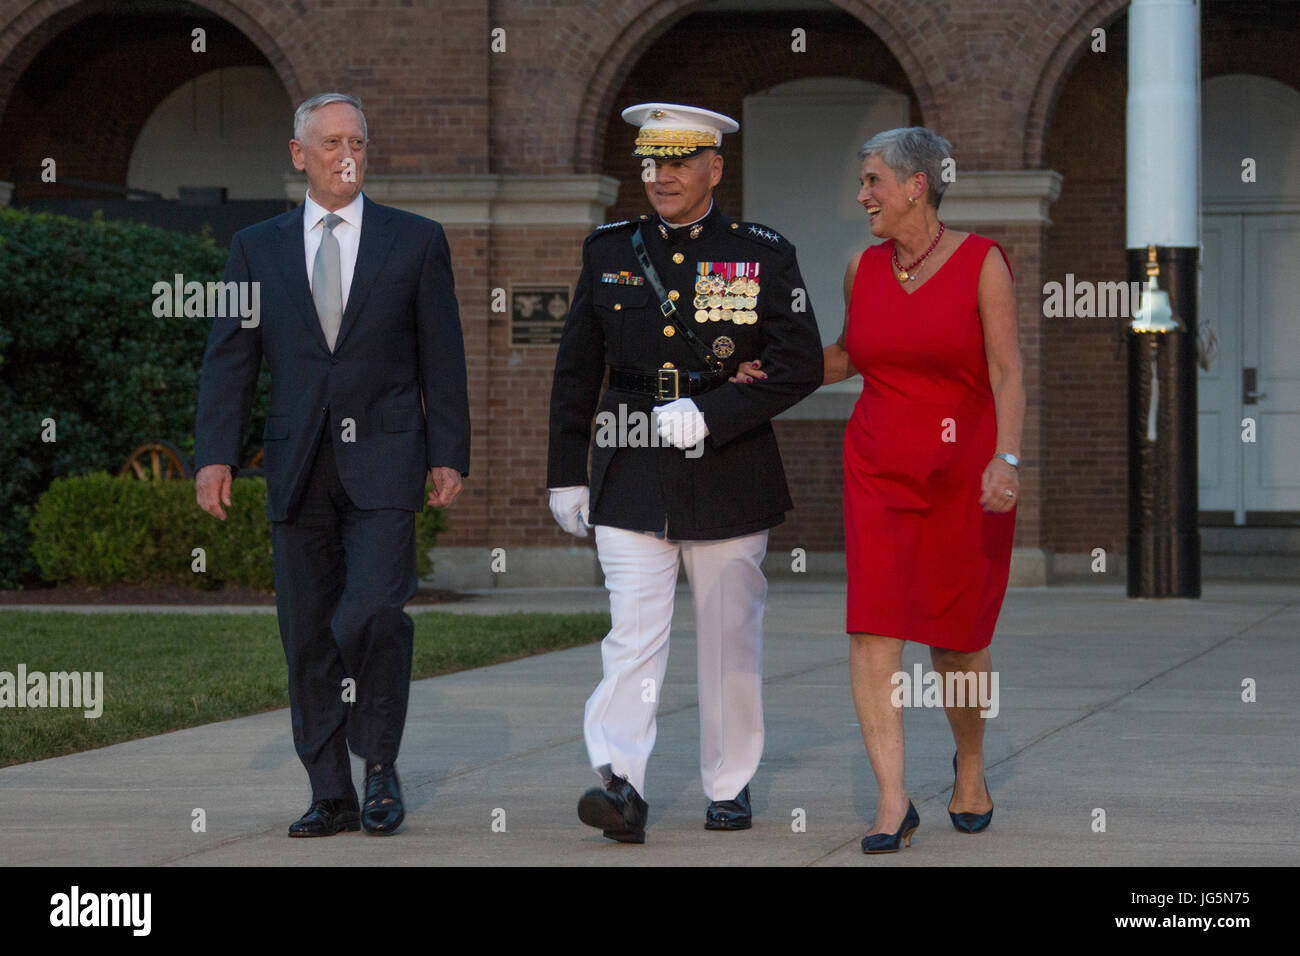 From left, Secretary James N. Mattis, Department ofDefense, Commandant of the Marine Corps Gen. Robert B. Neller, Stock Photo